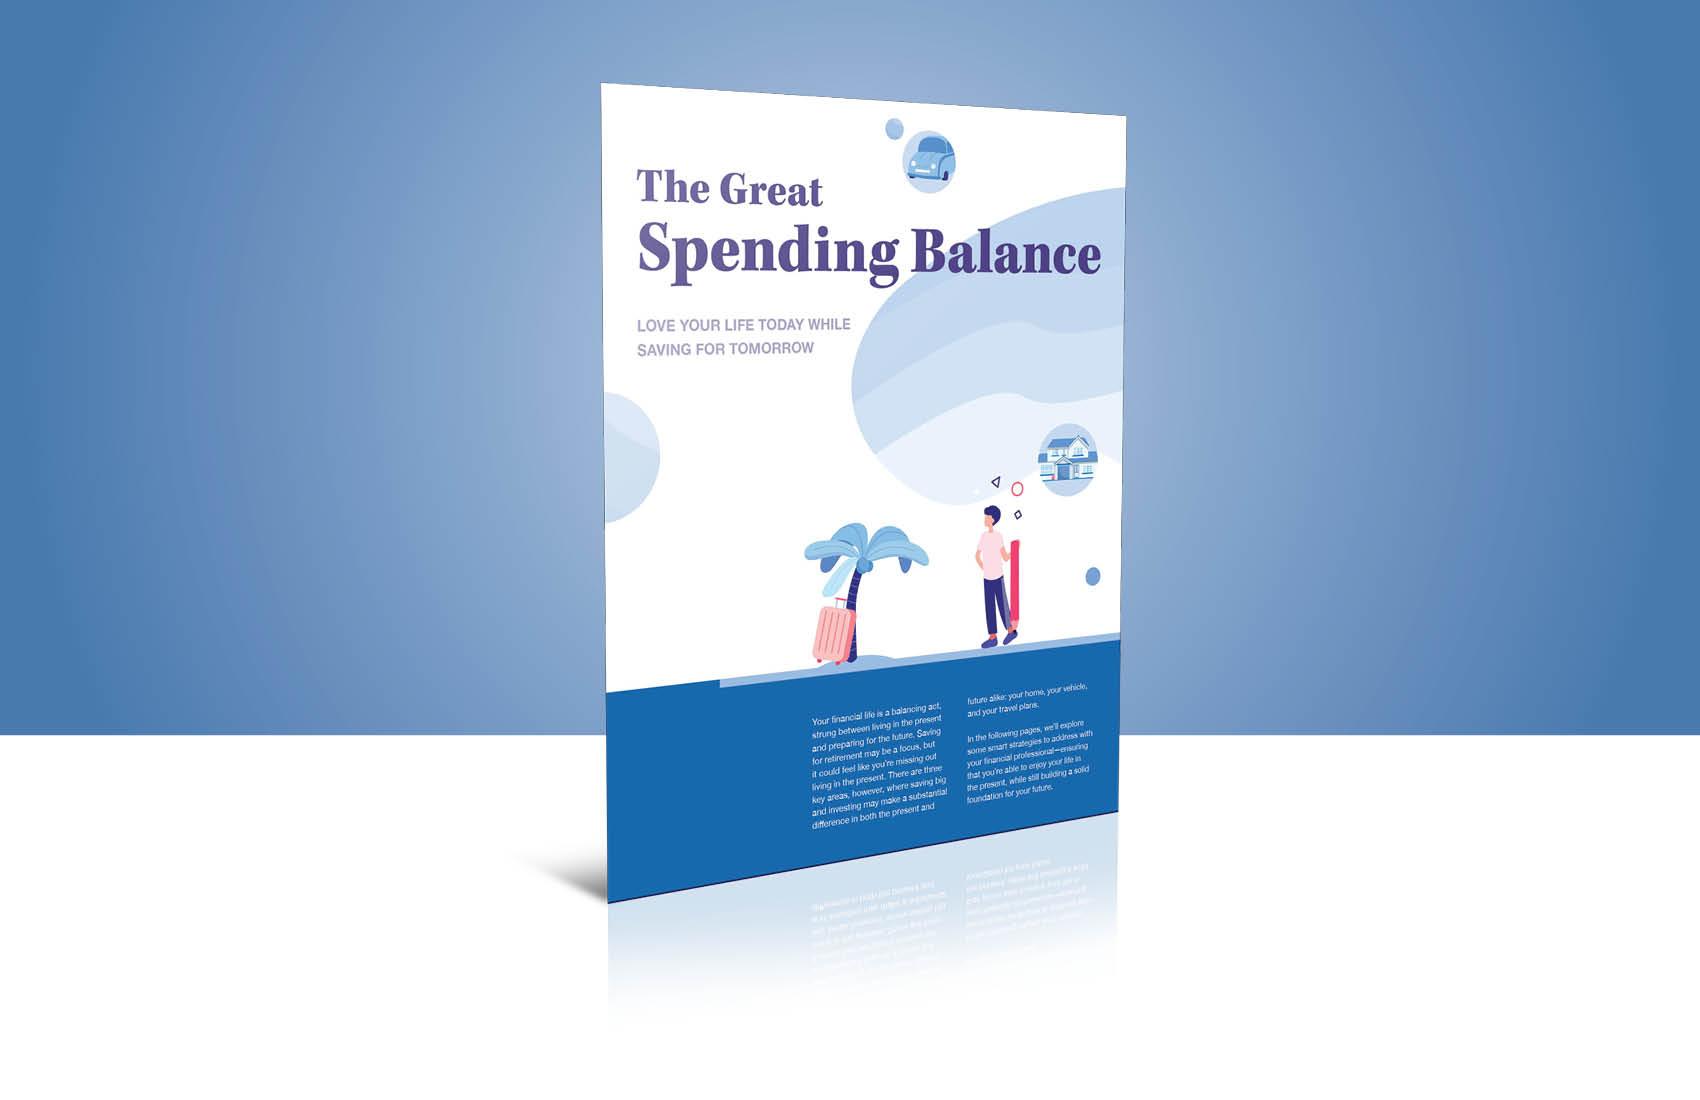 GreatSpendingBalance - White Paper